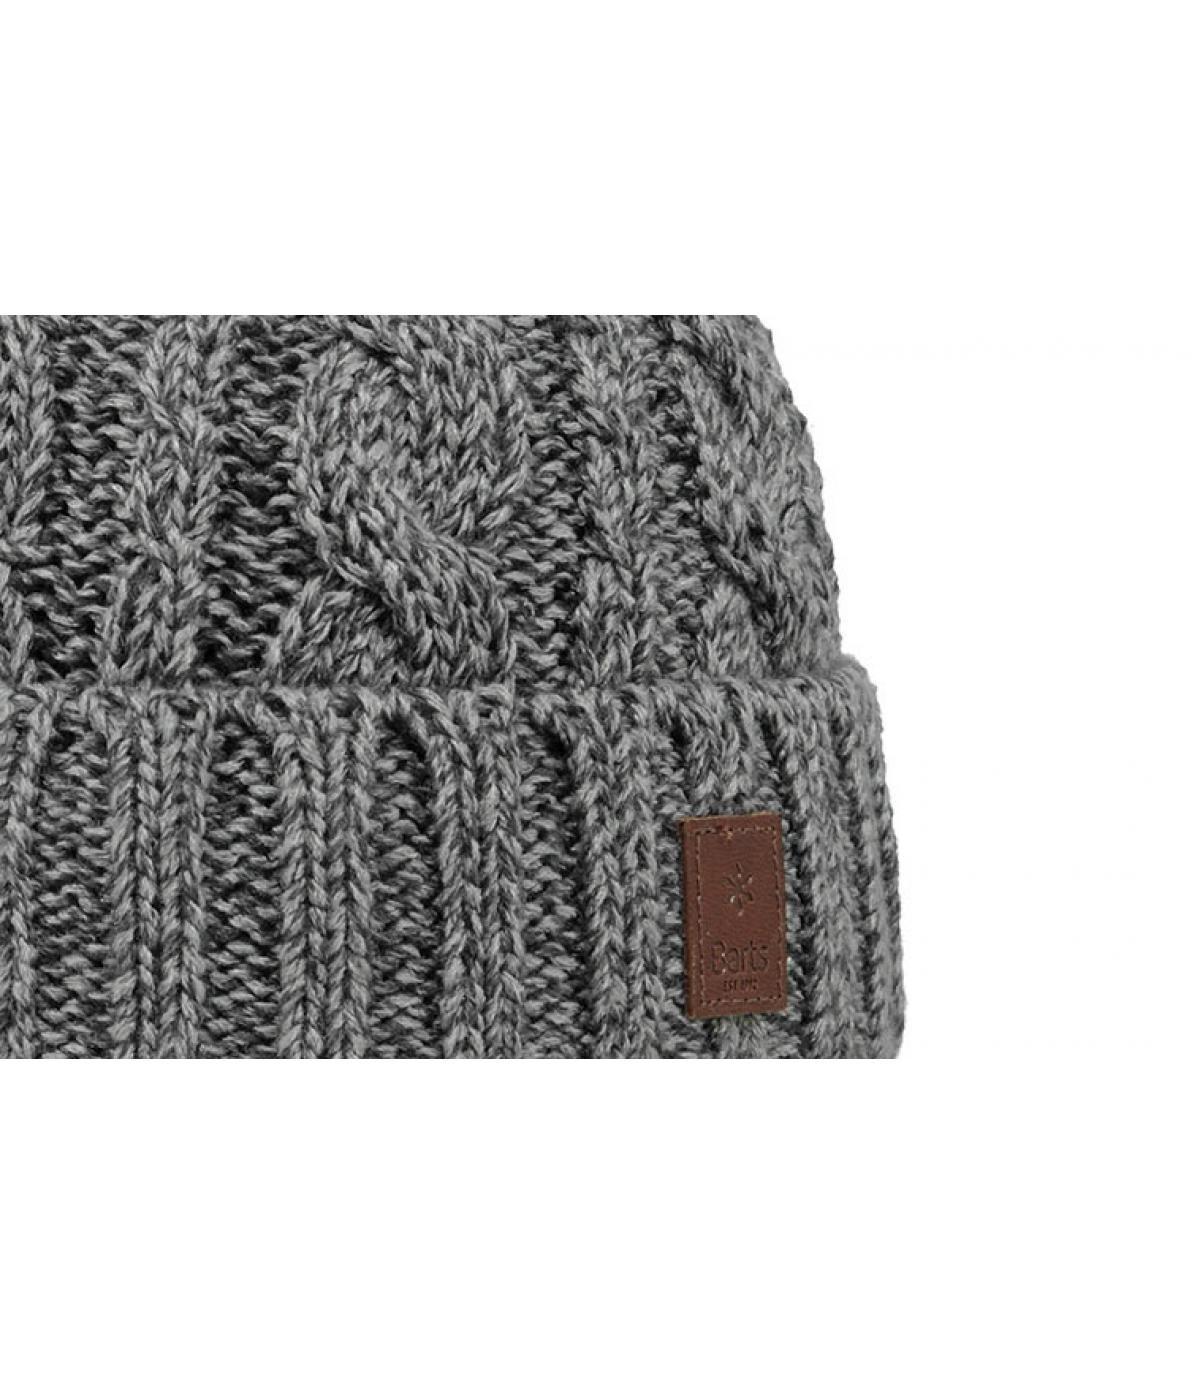 Détails Twister Turnup heather grey - image 3